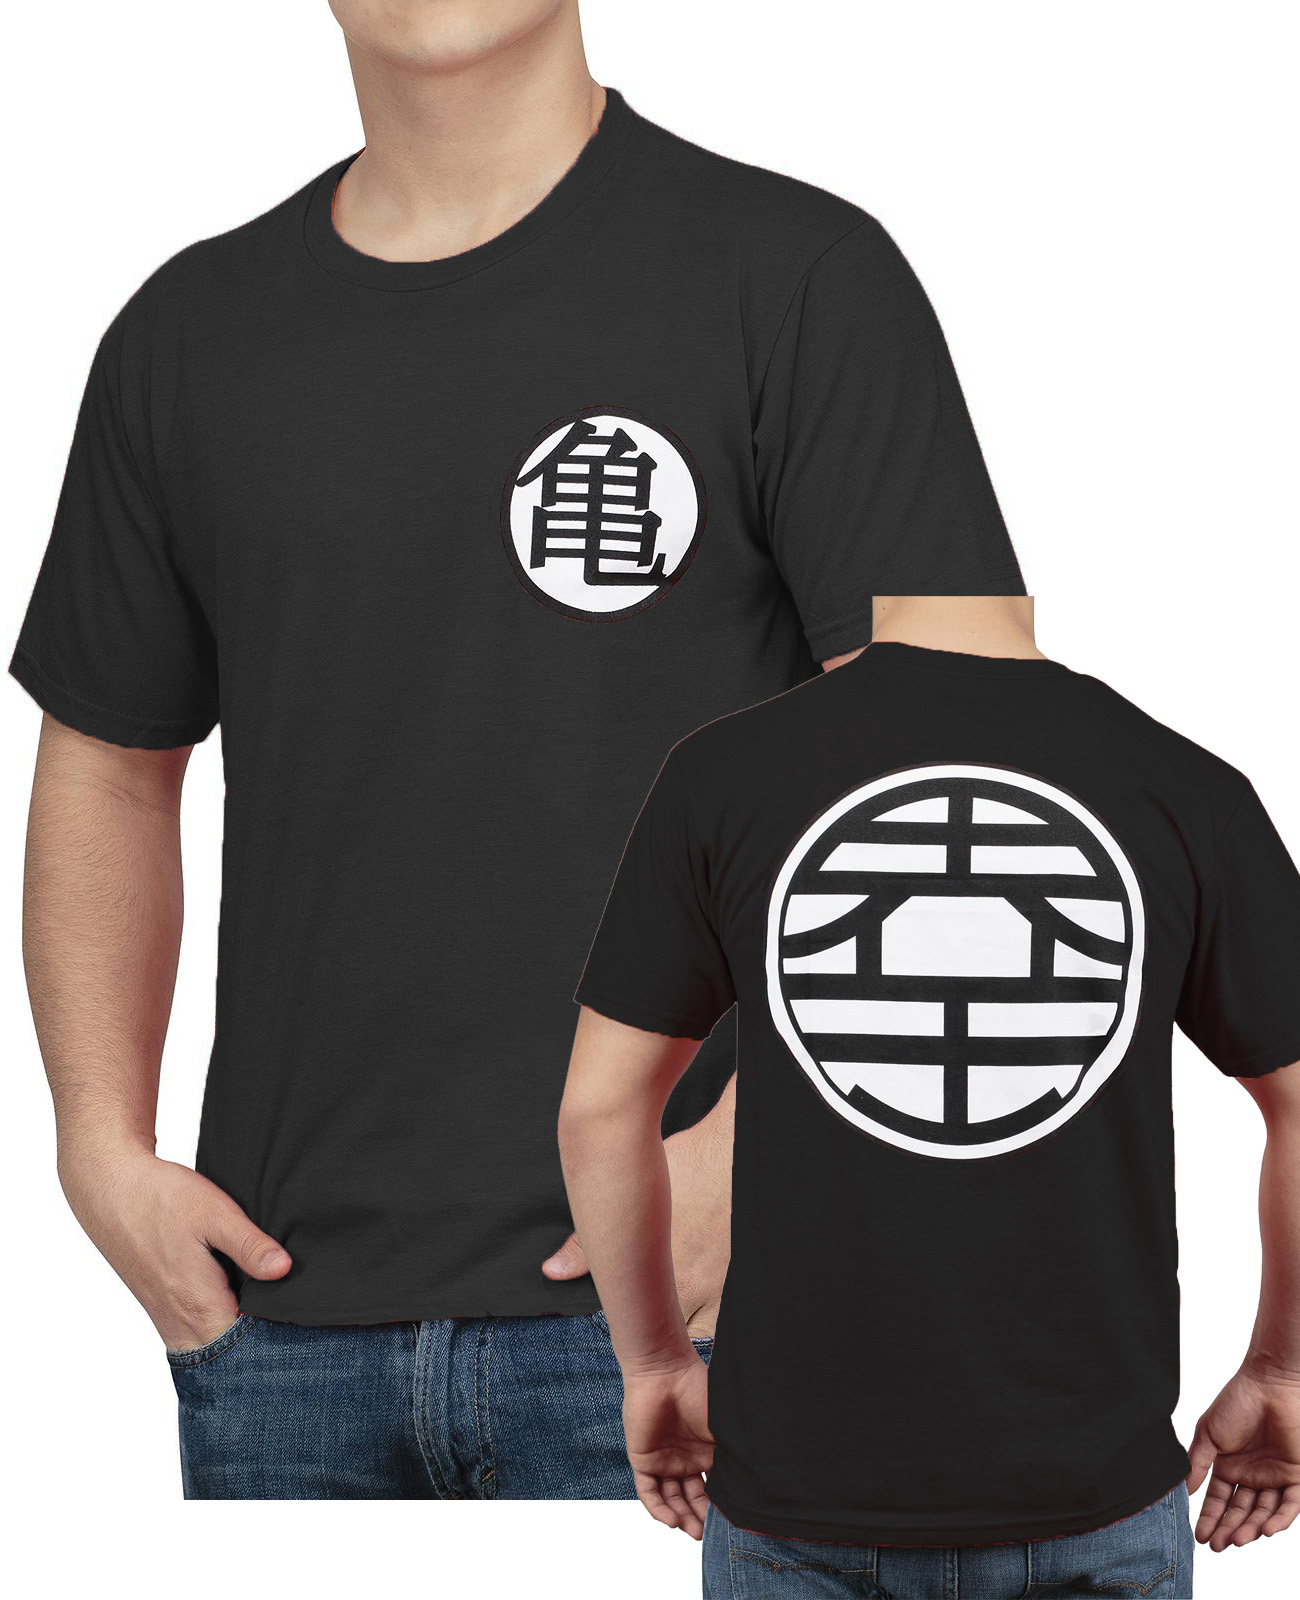 Animation T Shirt Dragon Ball Z Dragon Ball Clothes Symbol Kpop T